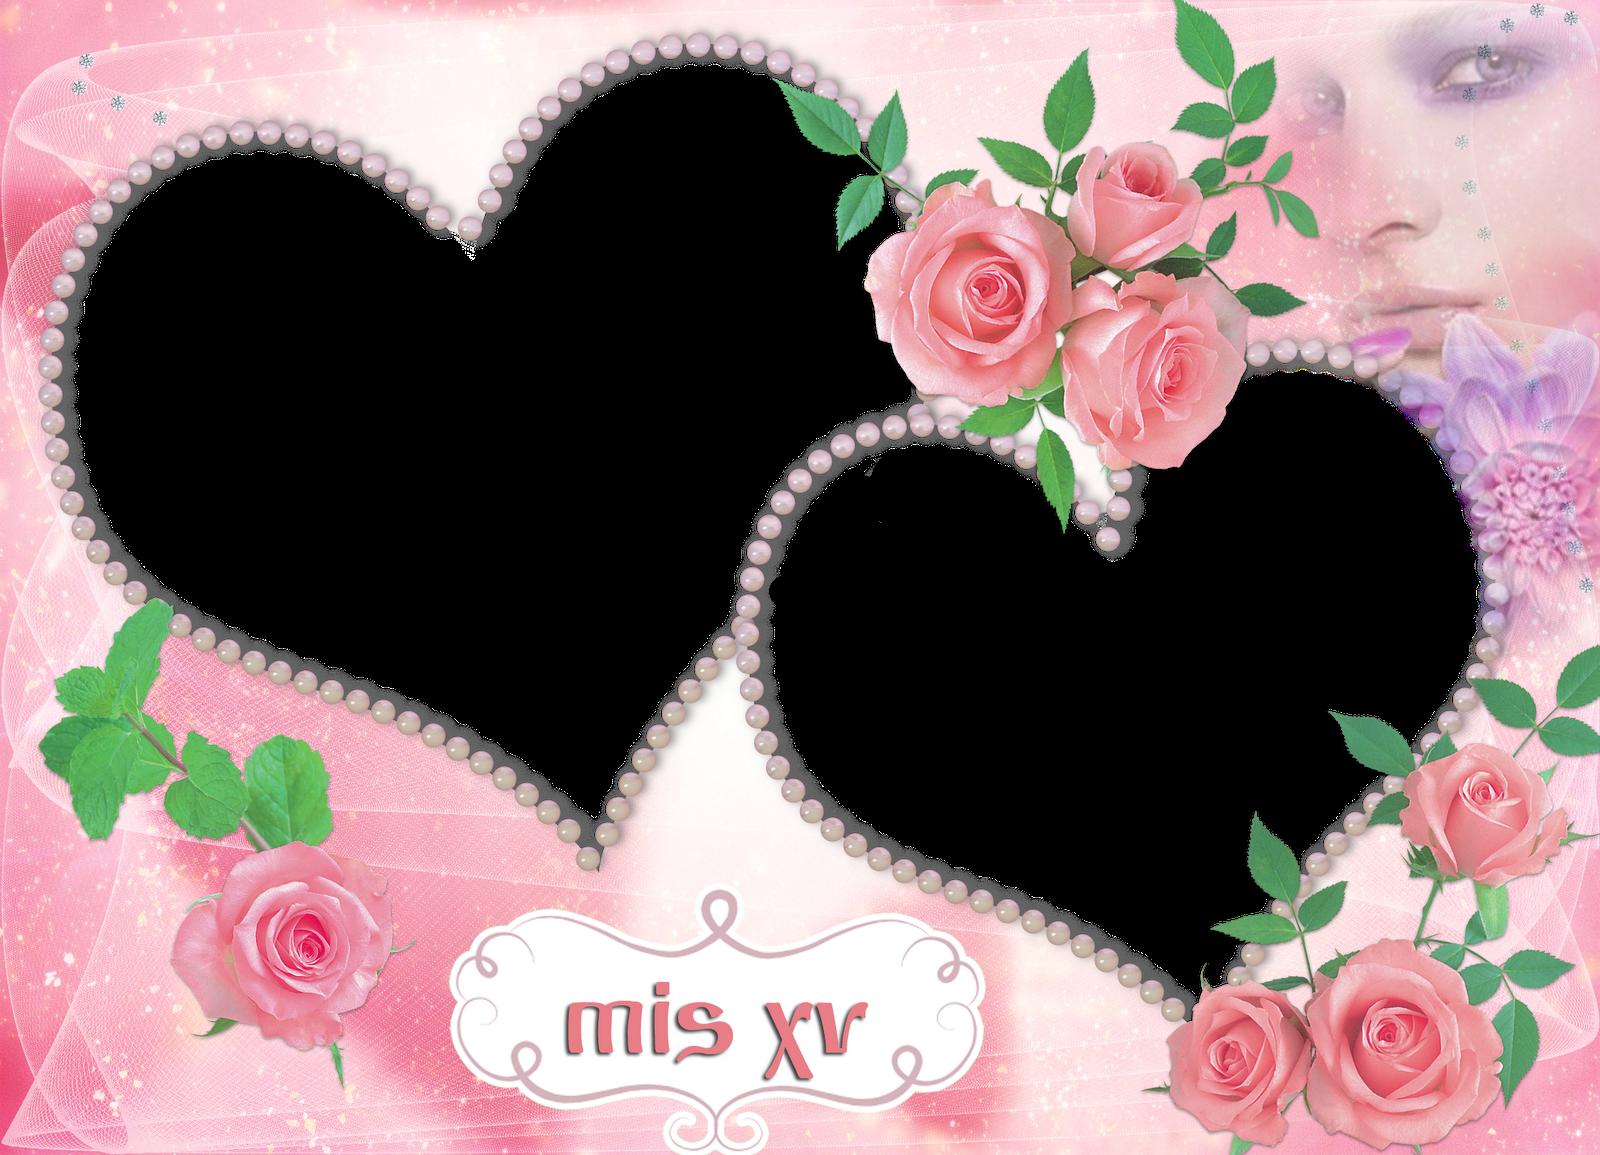 corazones cartas online